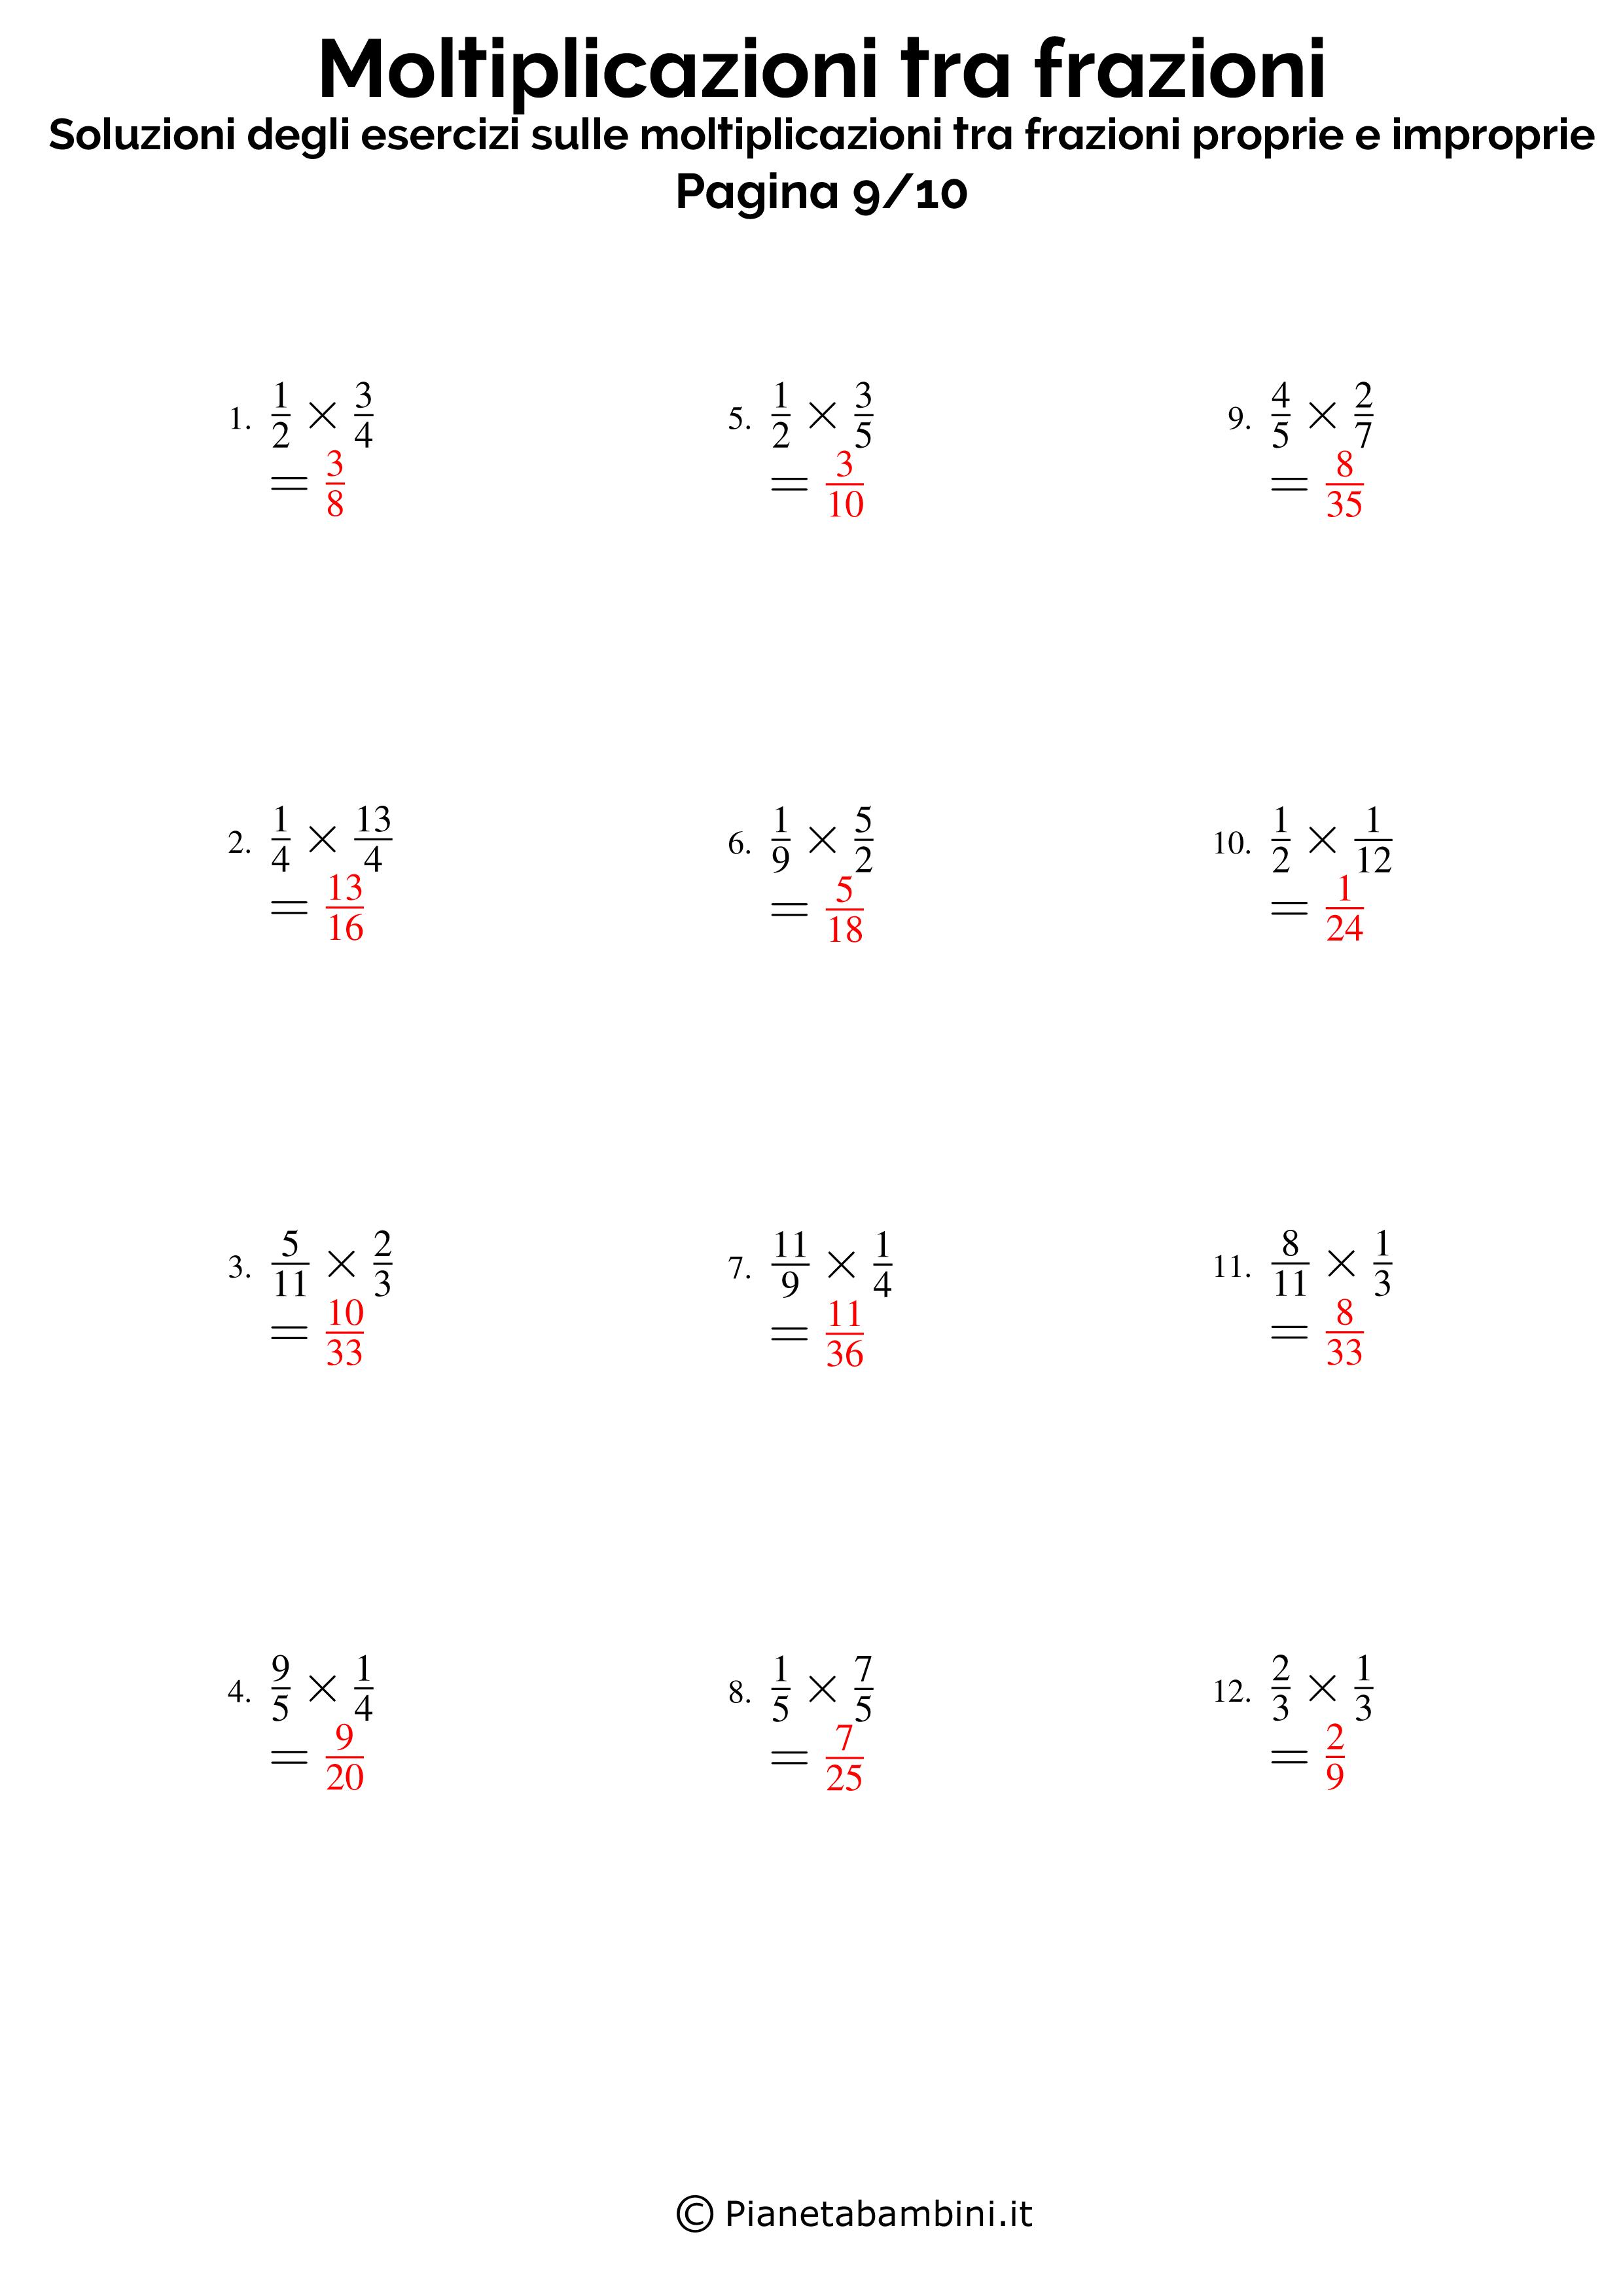 Soluzioni-Moltiplicazioni-Frazioni-Proprie-Improprie_09